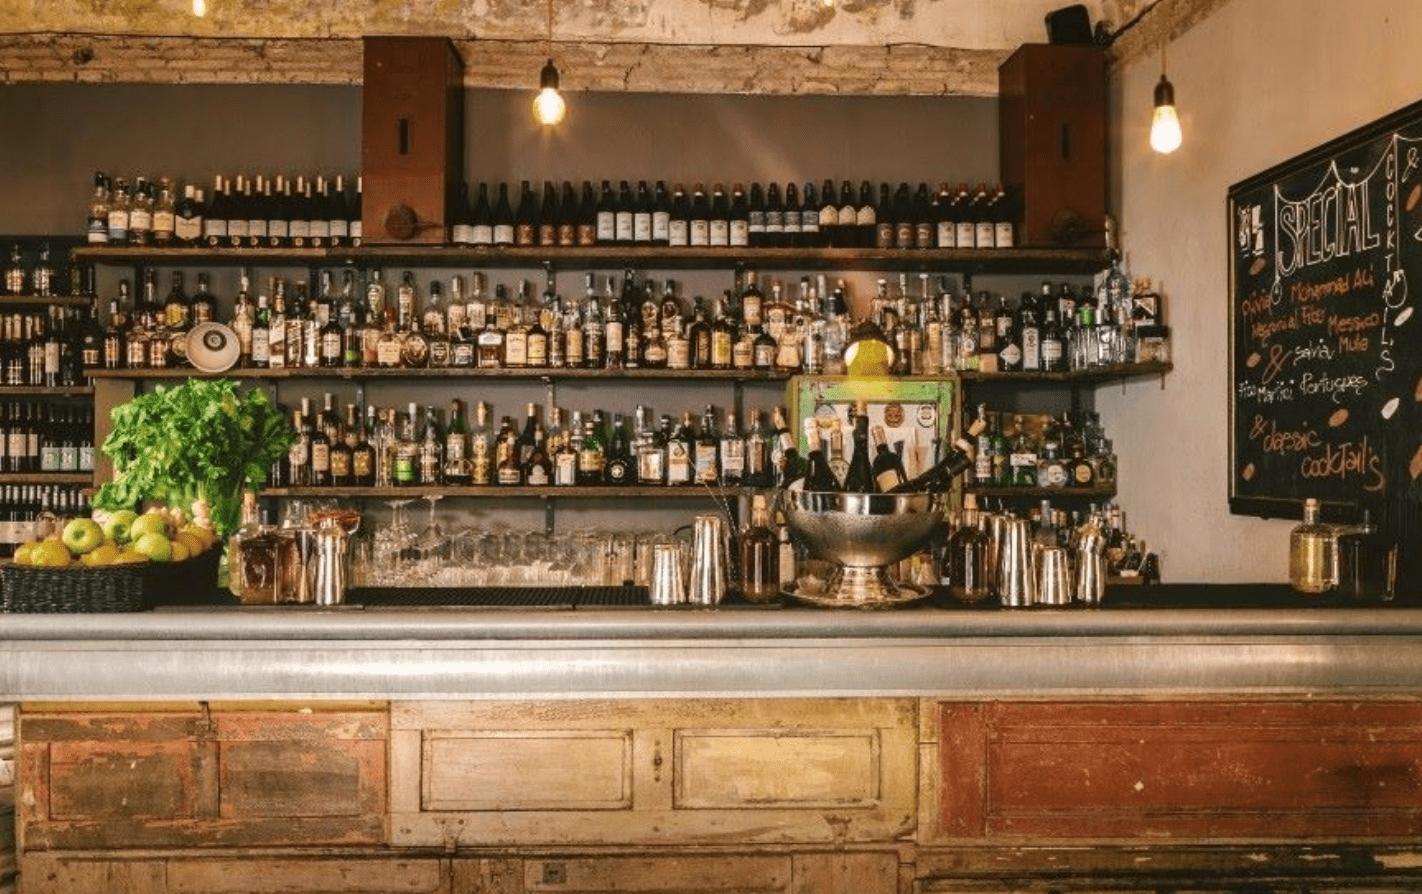 Wooden bar with various liquor bottles on shelves in bar del fico in Rome